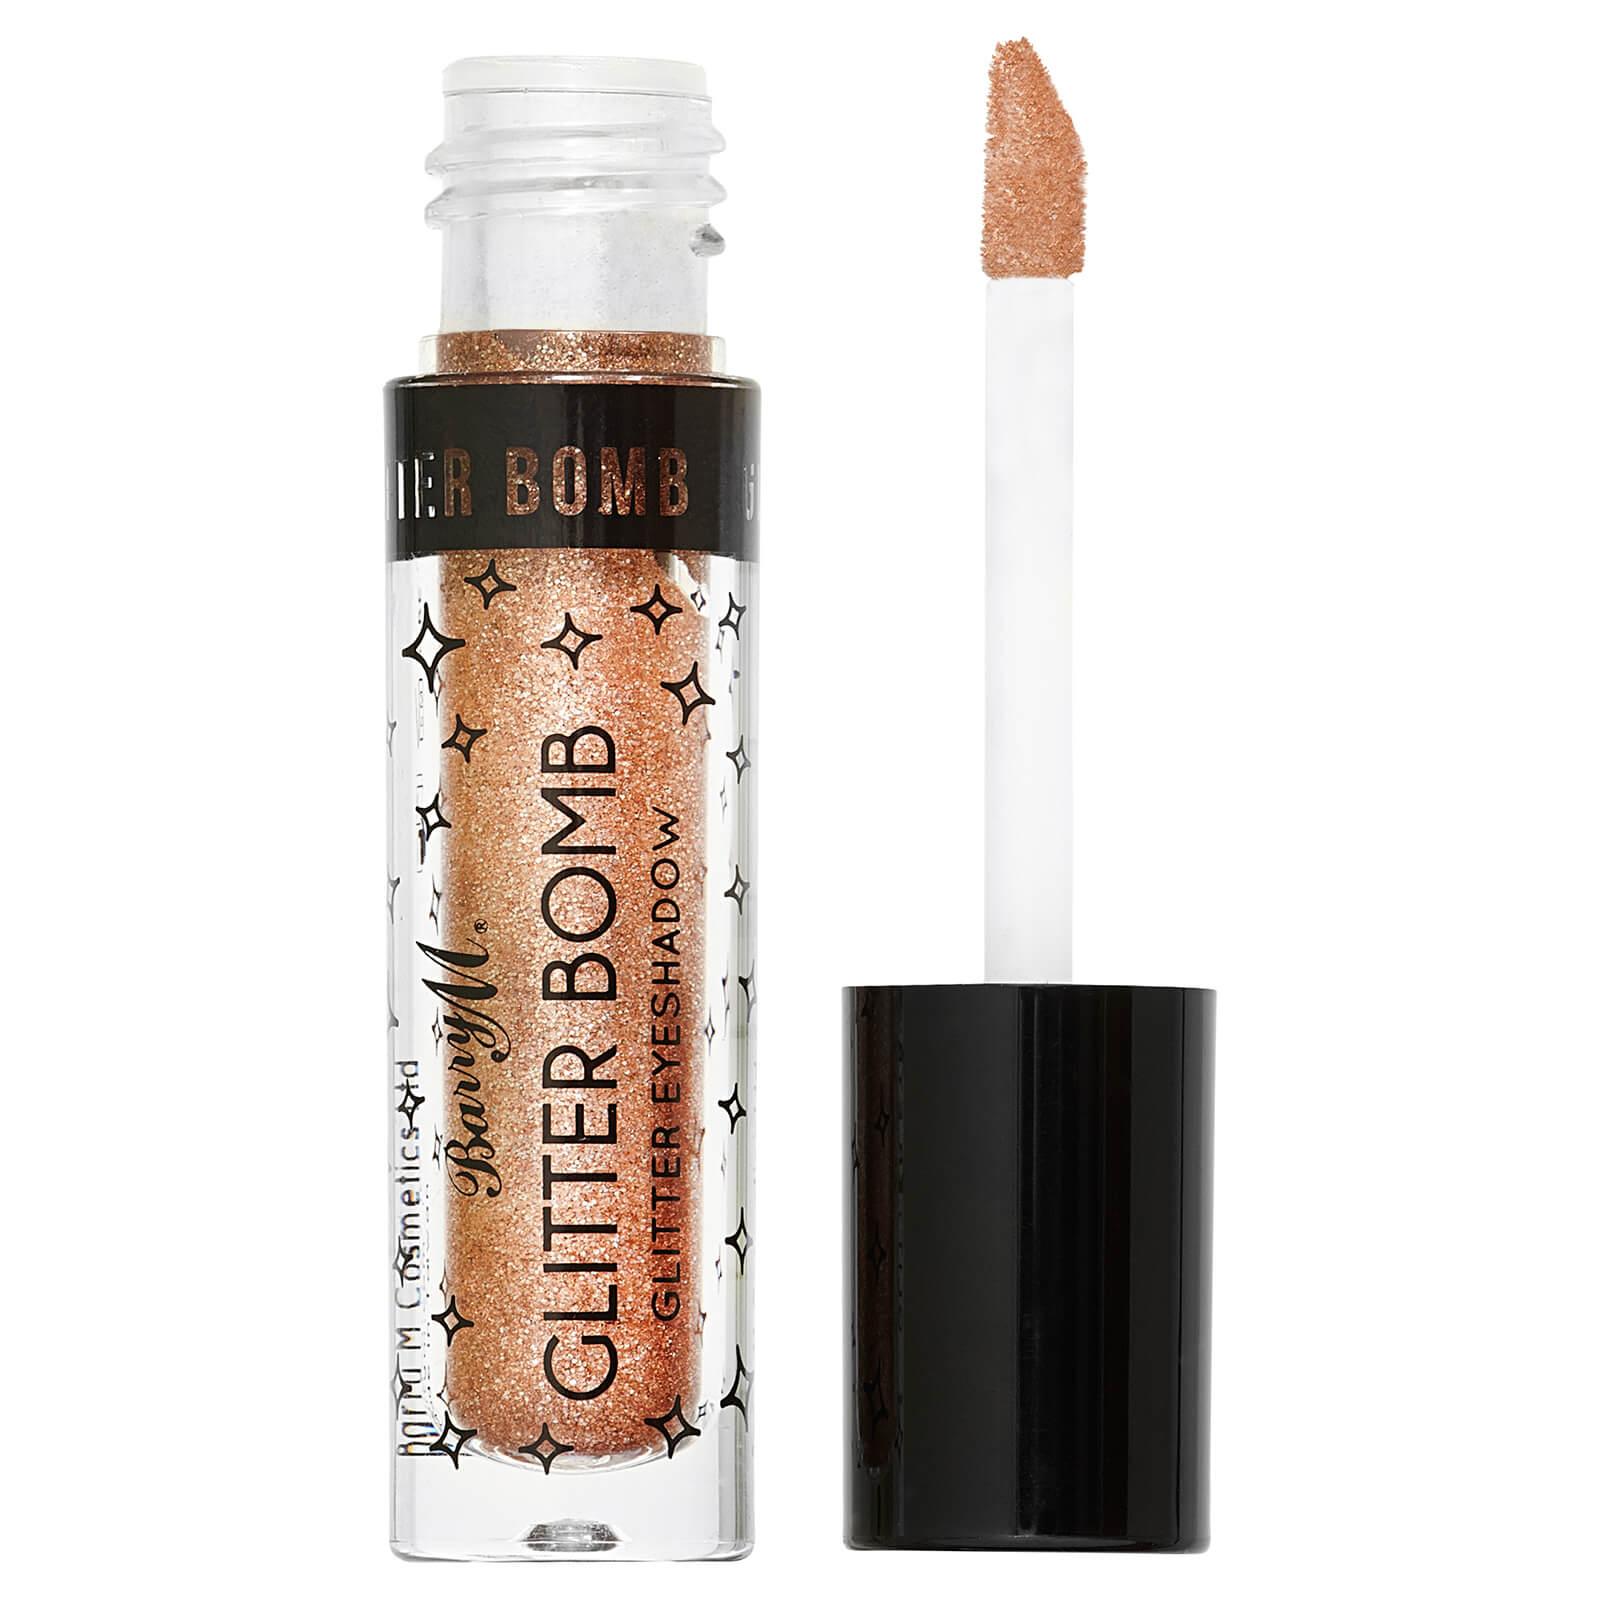 Barry M Cosmetics Glitter Bomb Eyeshadow (Various Shades) - Bronze